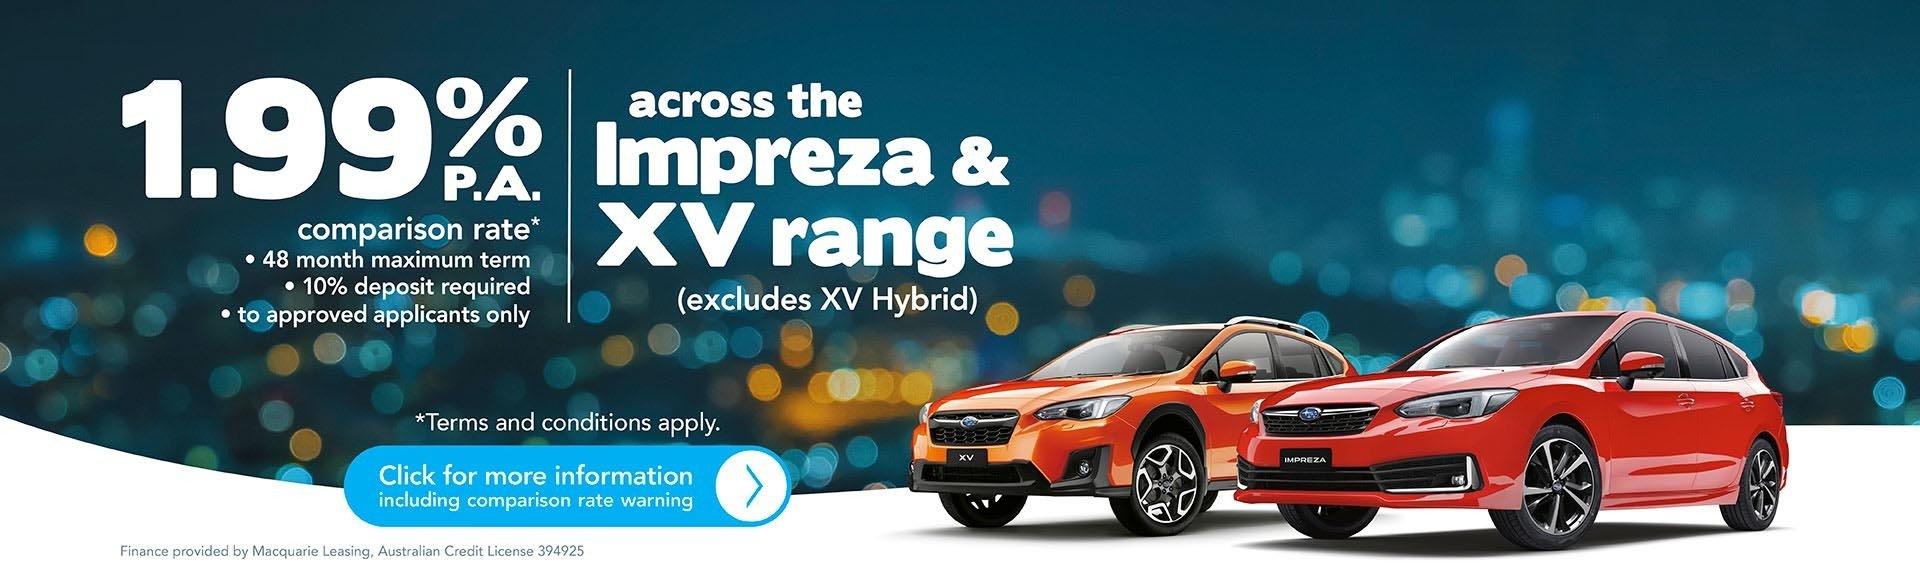 Subaru Castle Hill - Impreza & XV Range Finance Offer